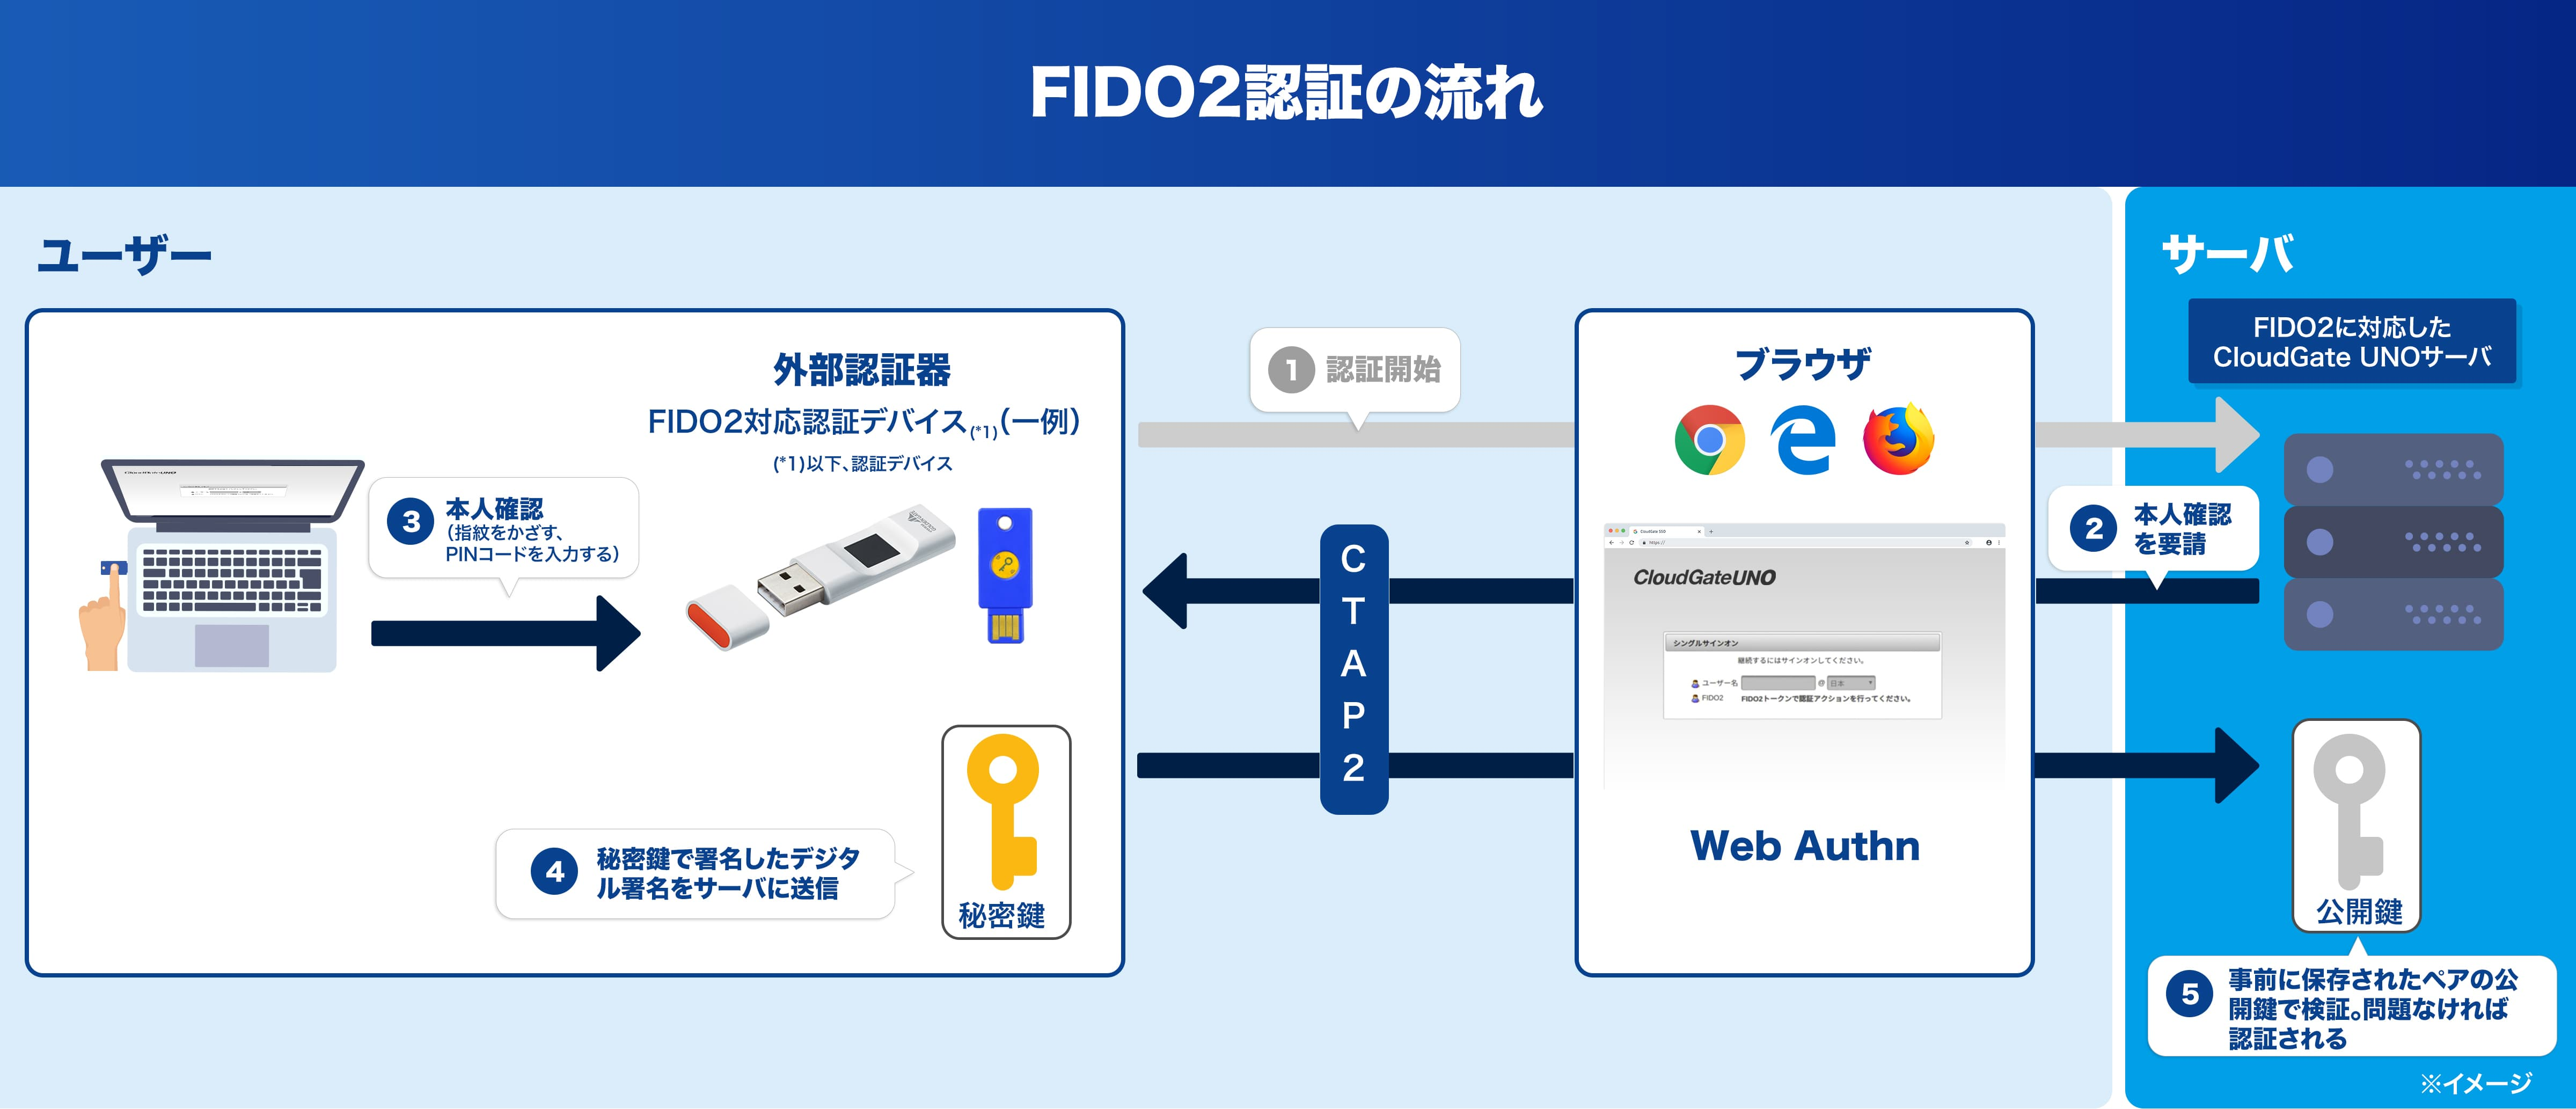 FIDO2登録の流れと認証の流れ - FIDO2 Flow Diagram